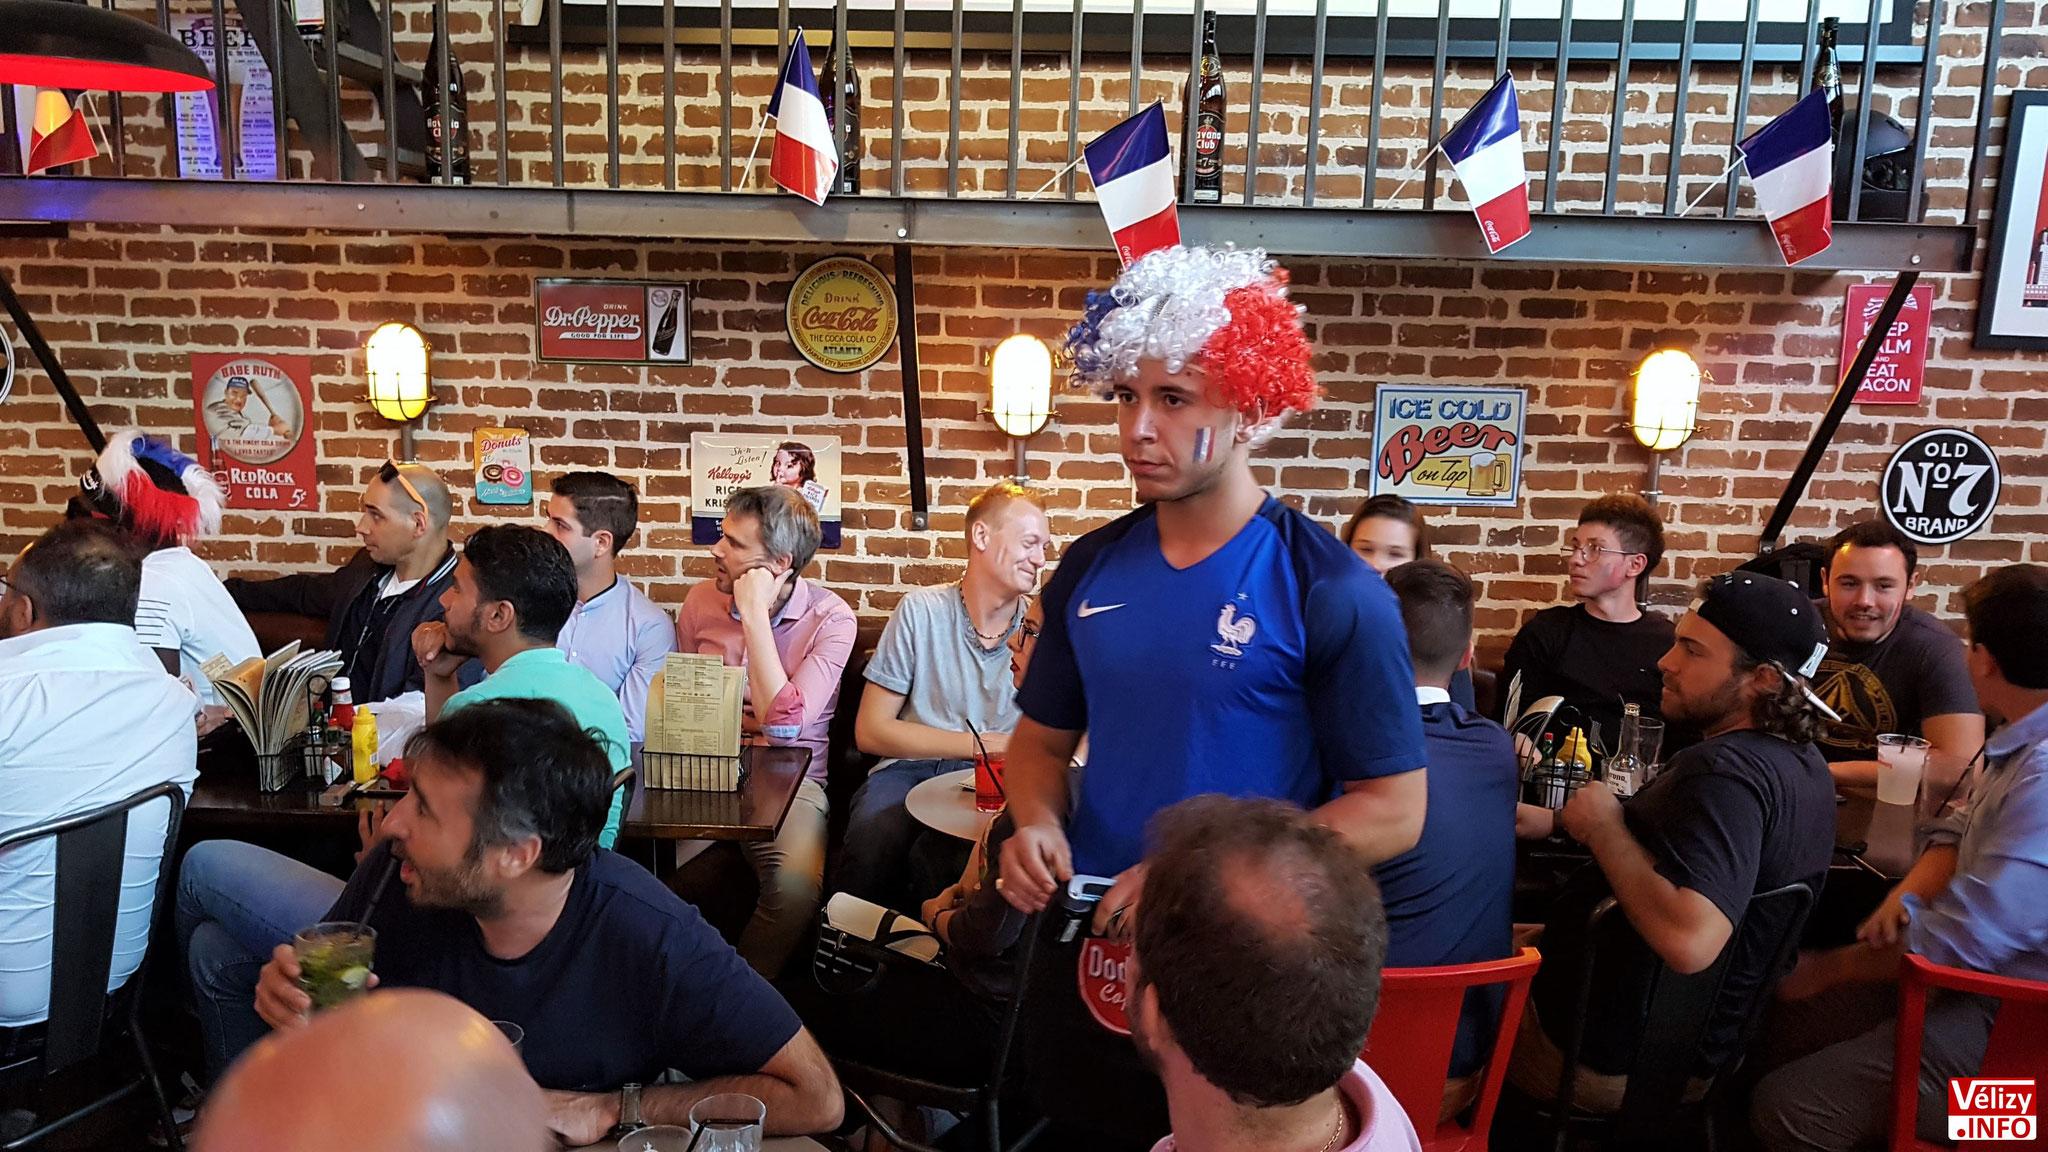 Doddy's Coffee Vélizy - Demi-Finale :  France / Belgique - Mardi 10 juillet 2018.